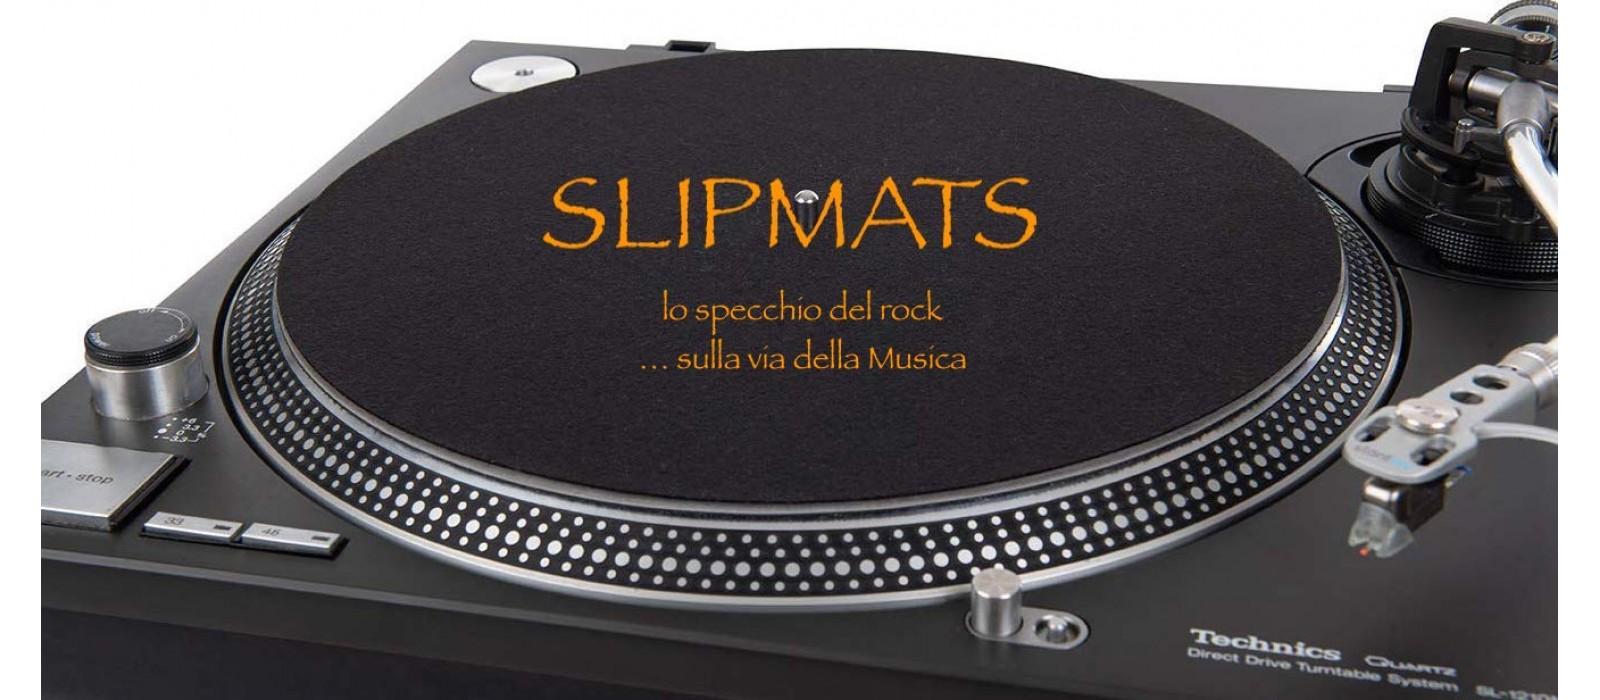 SLIPMATS